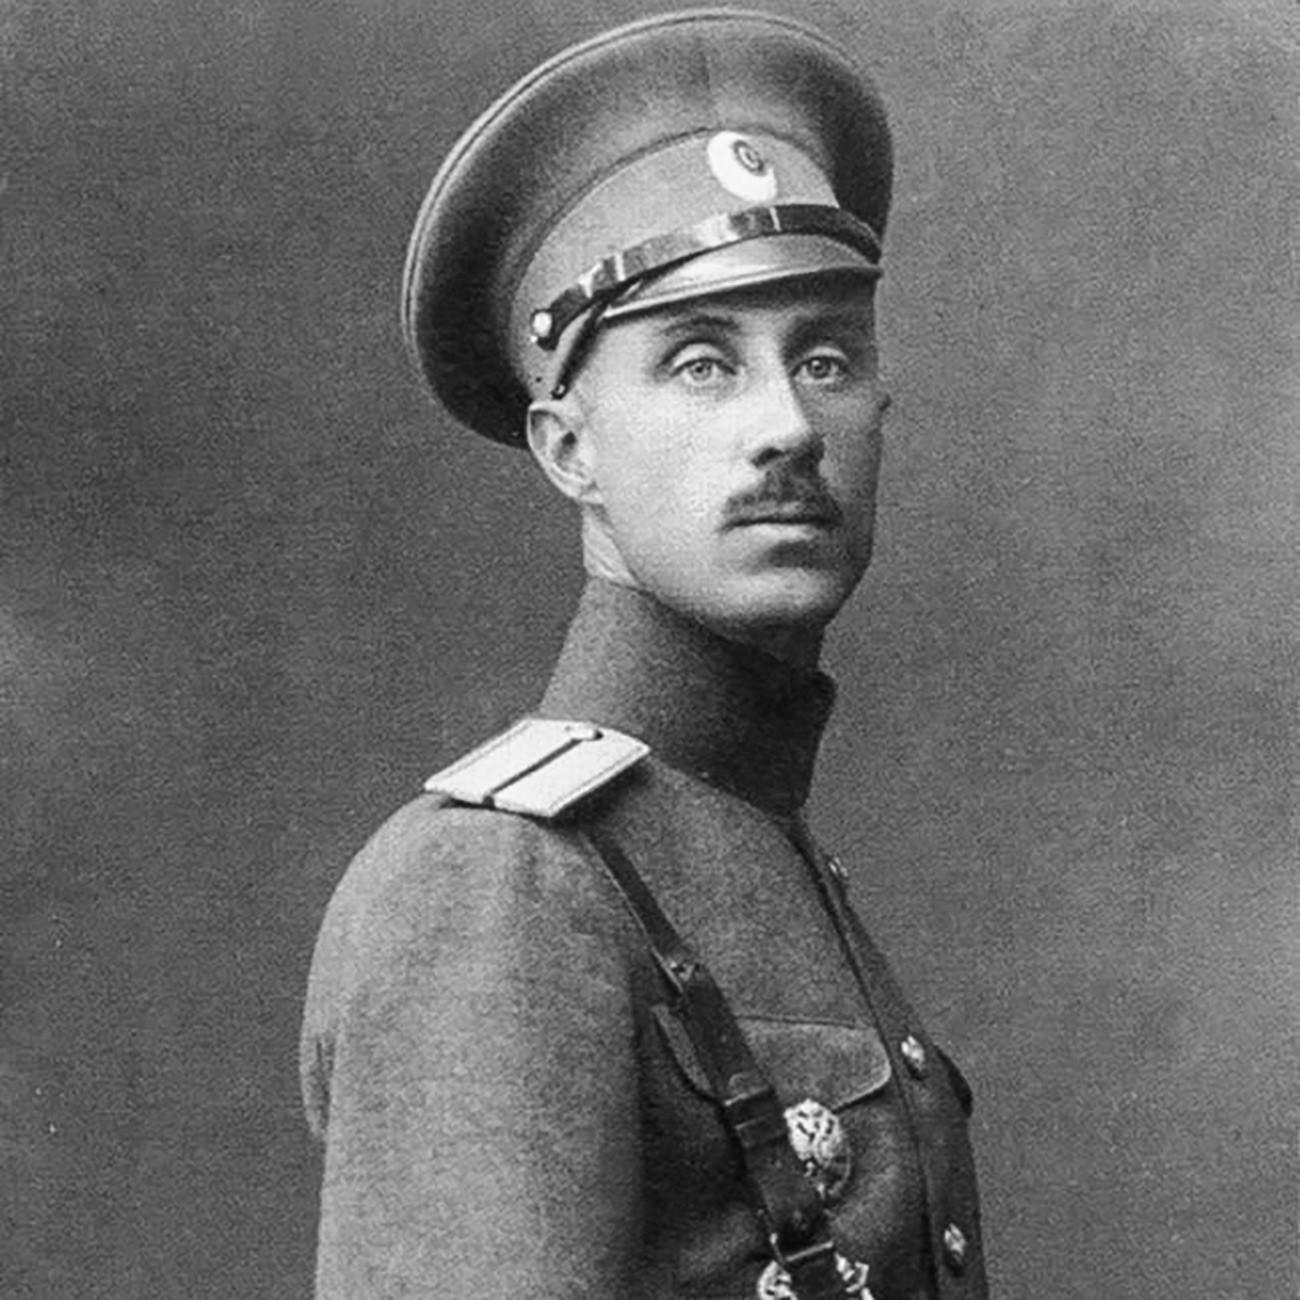 Piotr Wrangel (1878 – 1928)